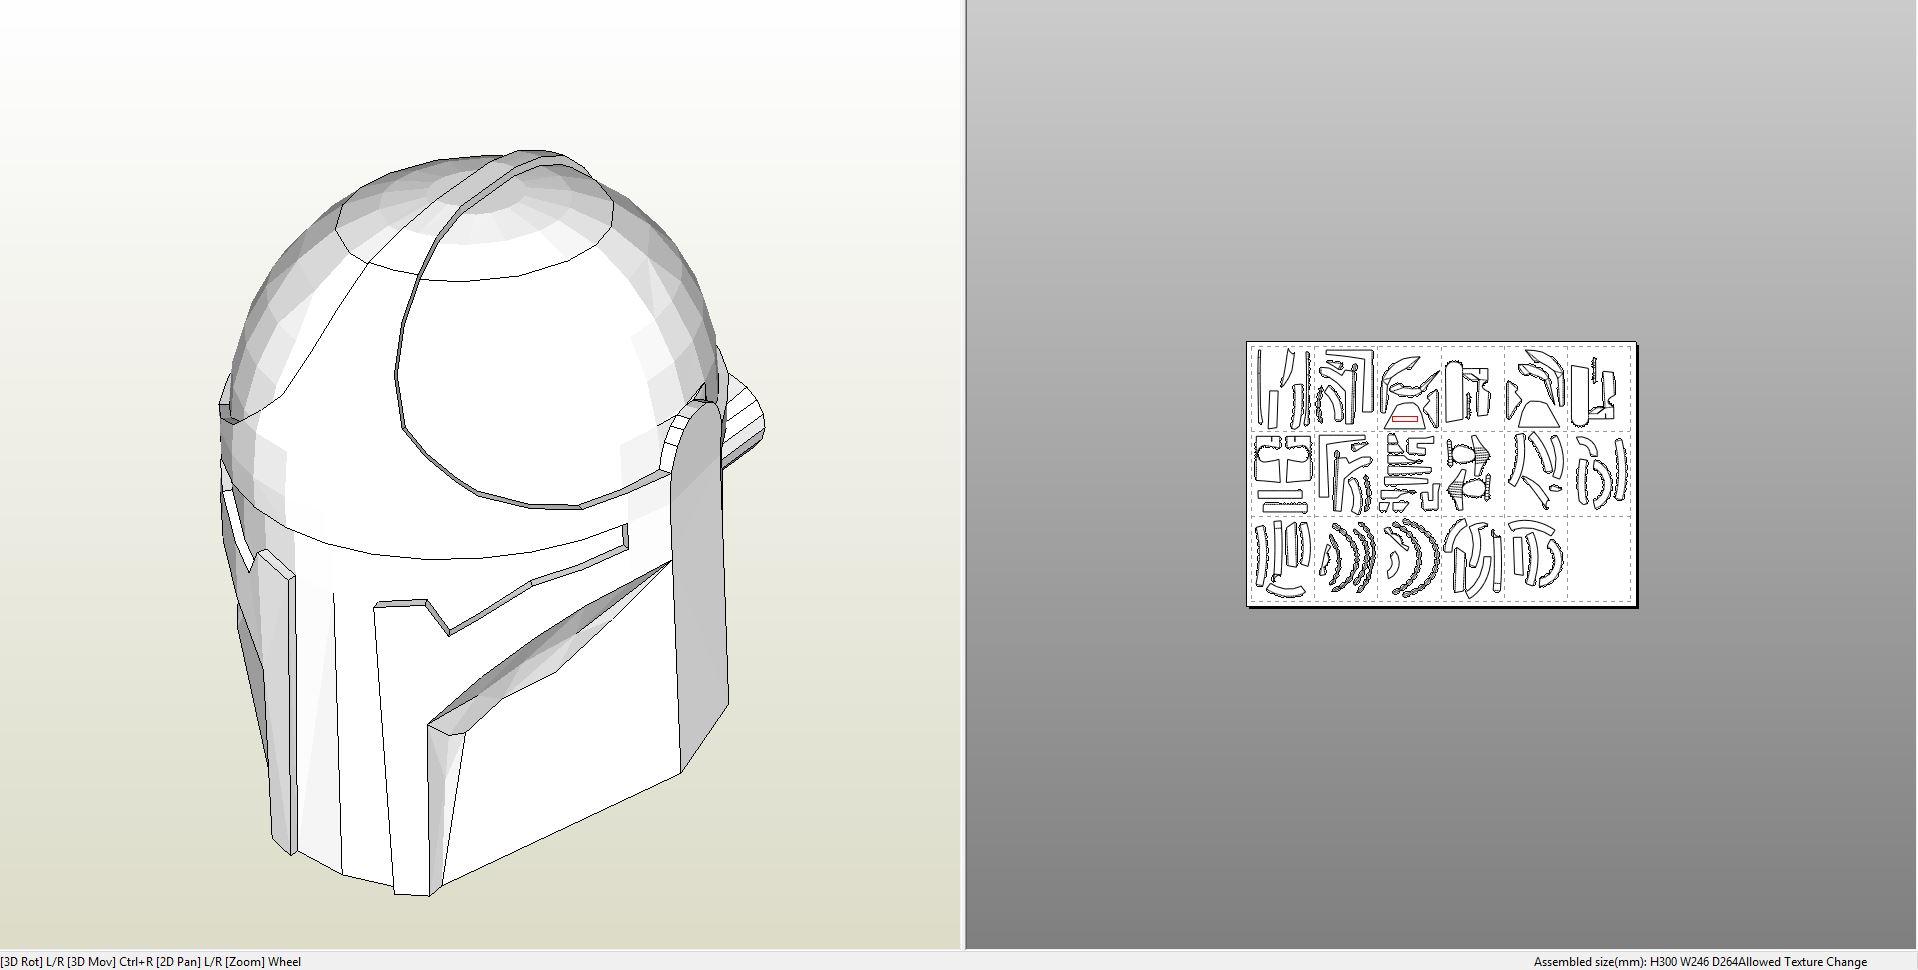 Papercraft Pdo File Template For Star Wars Modified Boba Fett Helmet